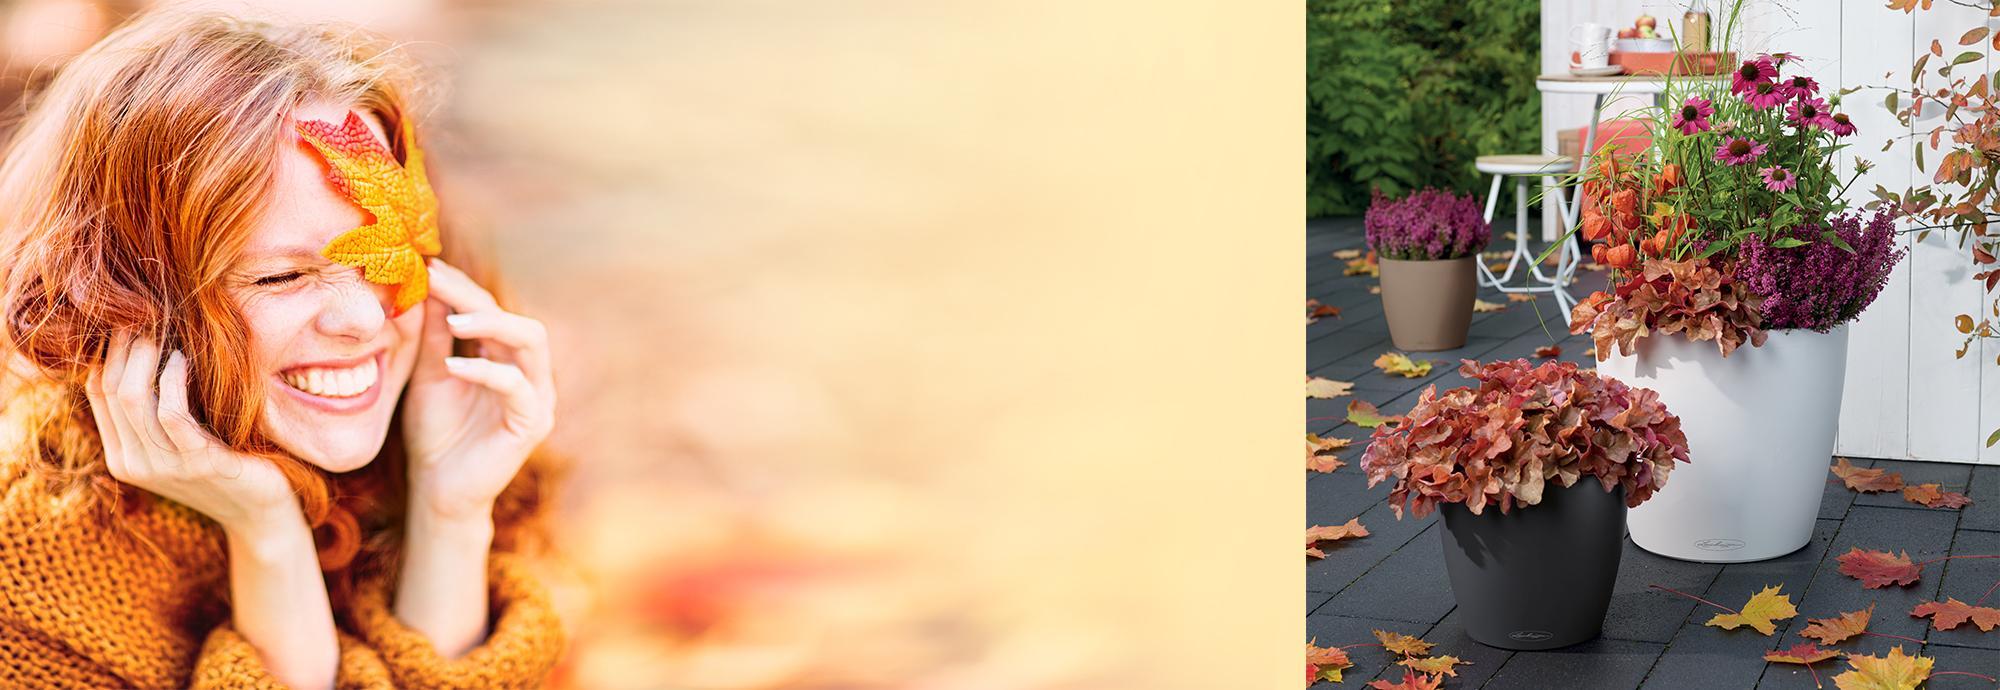 Herbstgeflüster mit dem CLASSICO Color